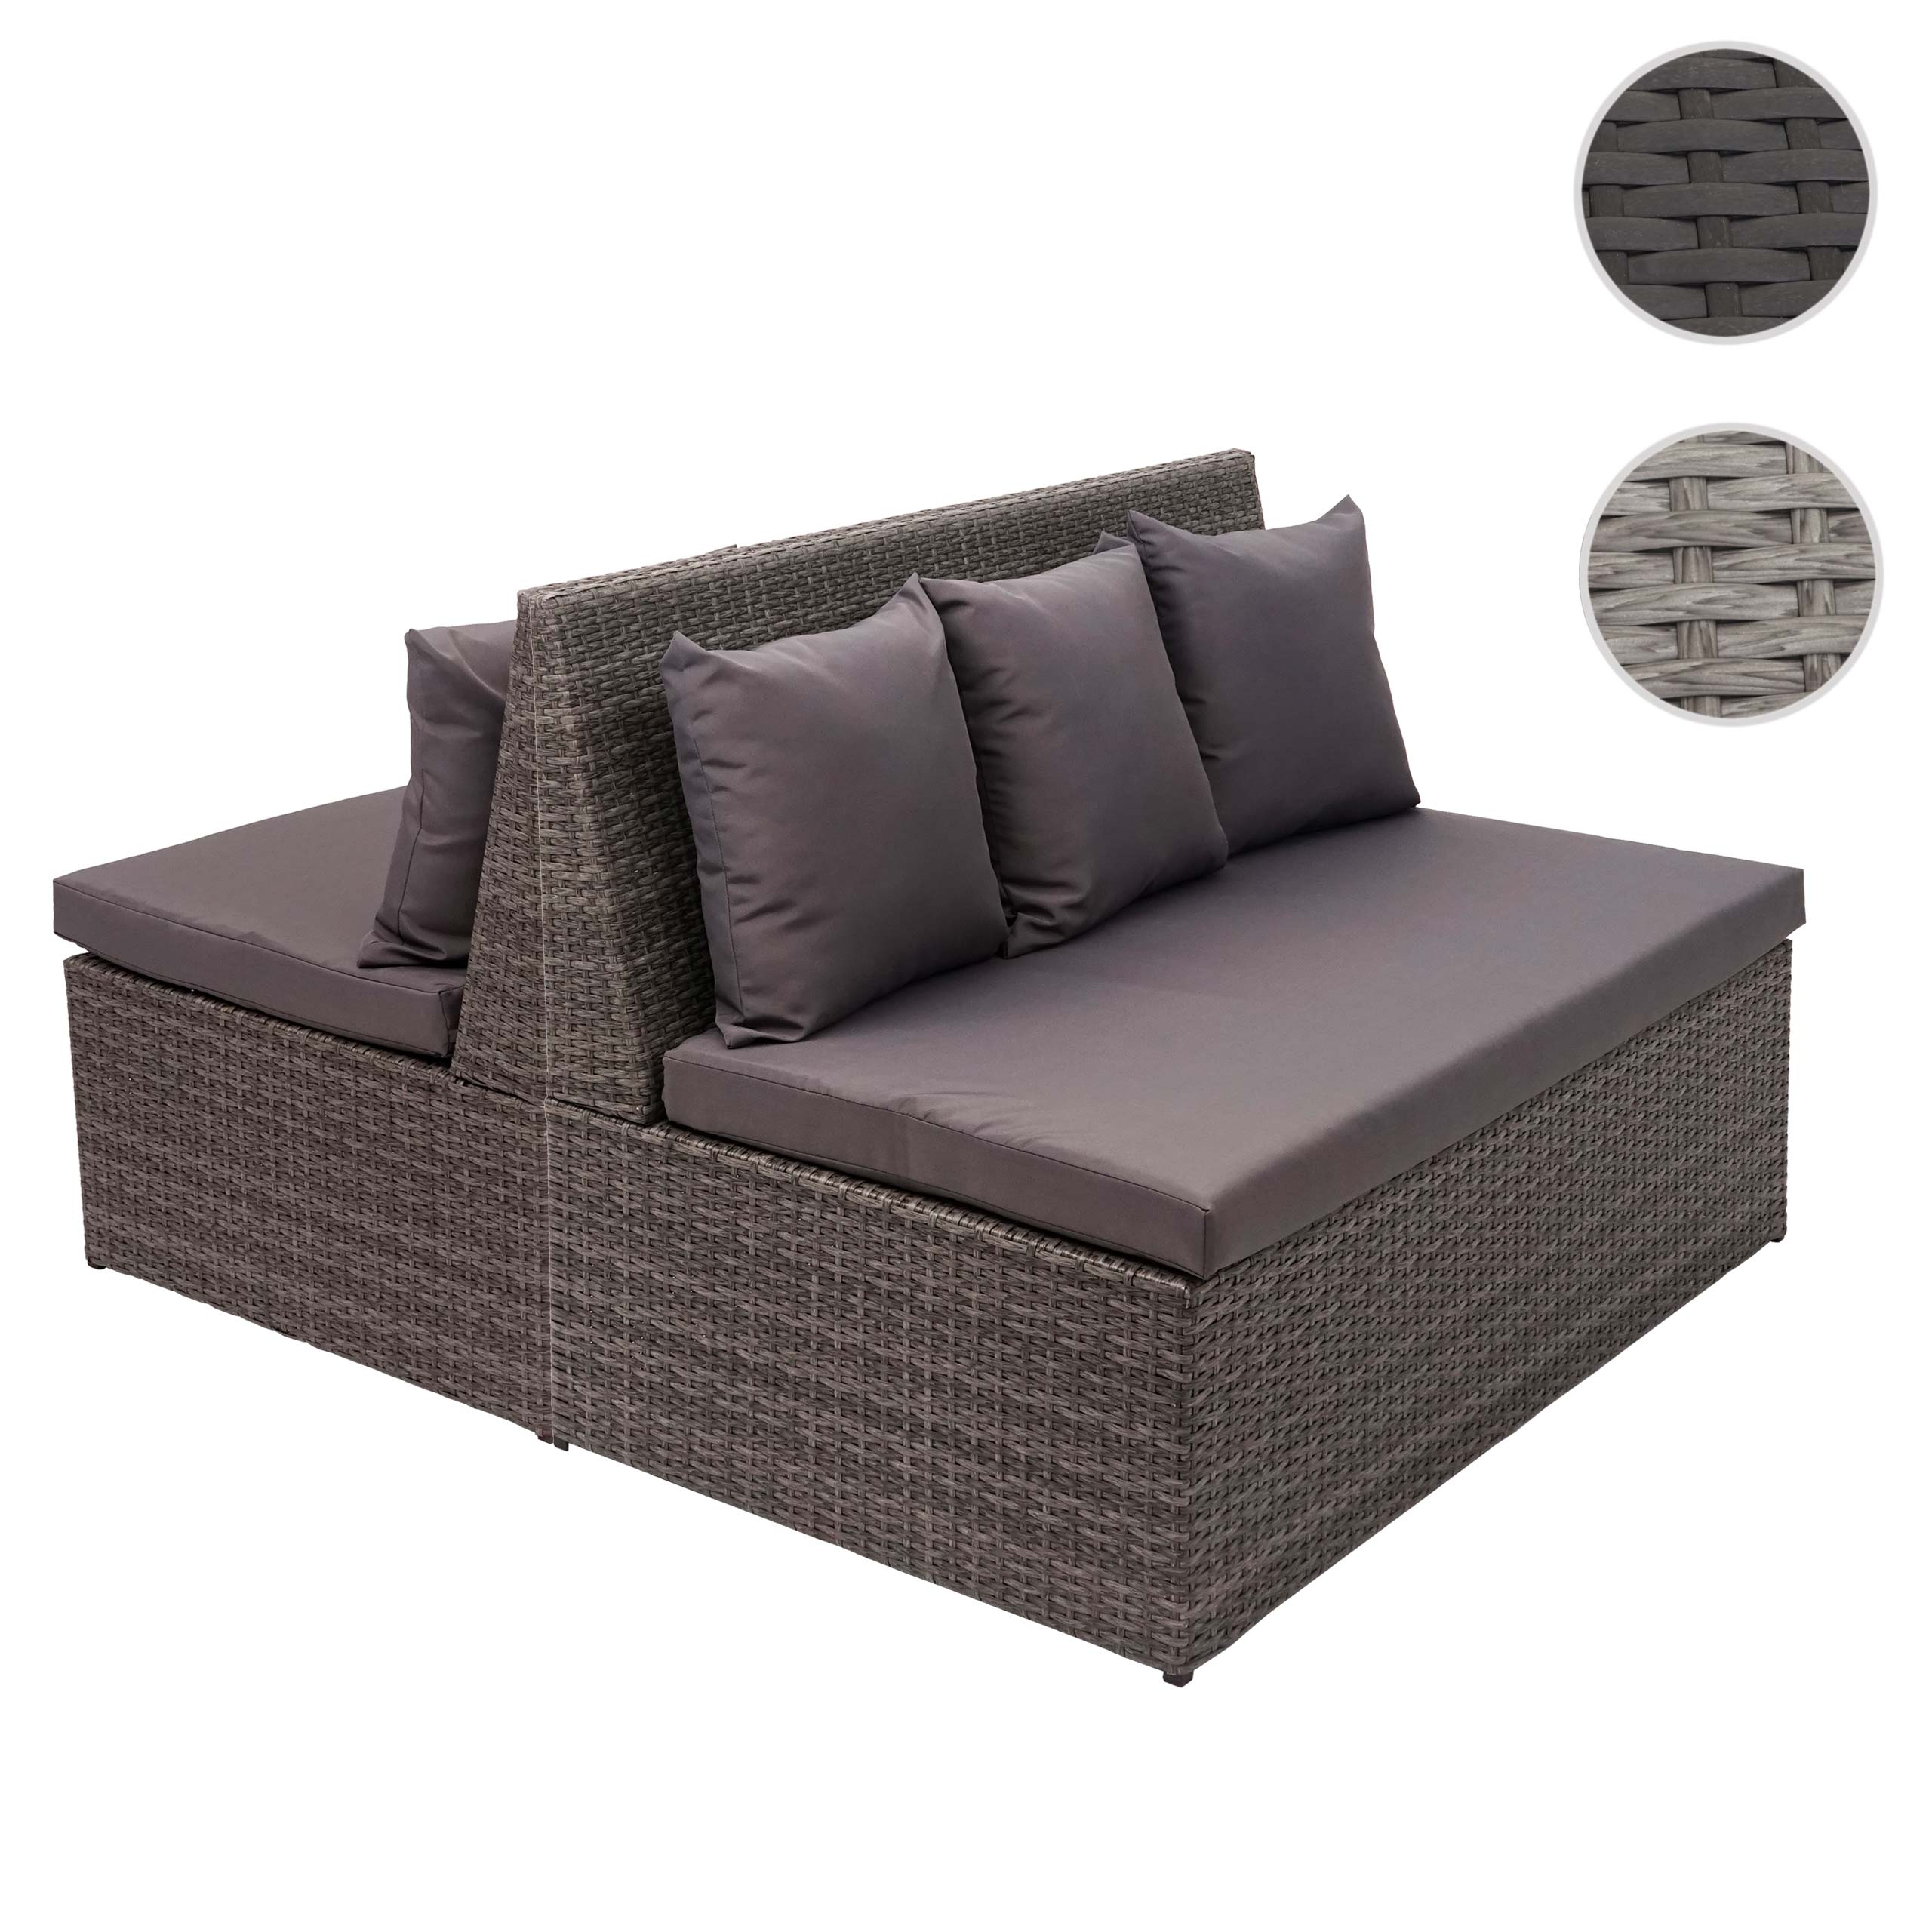 Mendler 2x Poly-Rattan 2er Sofa HWC-G16, Lounge-Gartenbank Sitzbank Sessel, Gastronomie 120cm ~ schwarz, Kis 2x70868